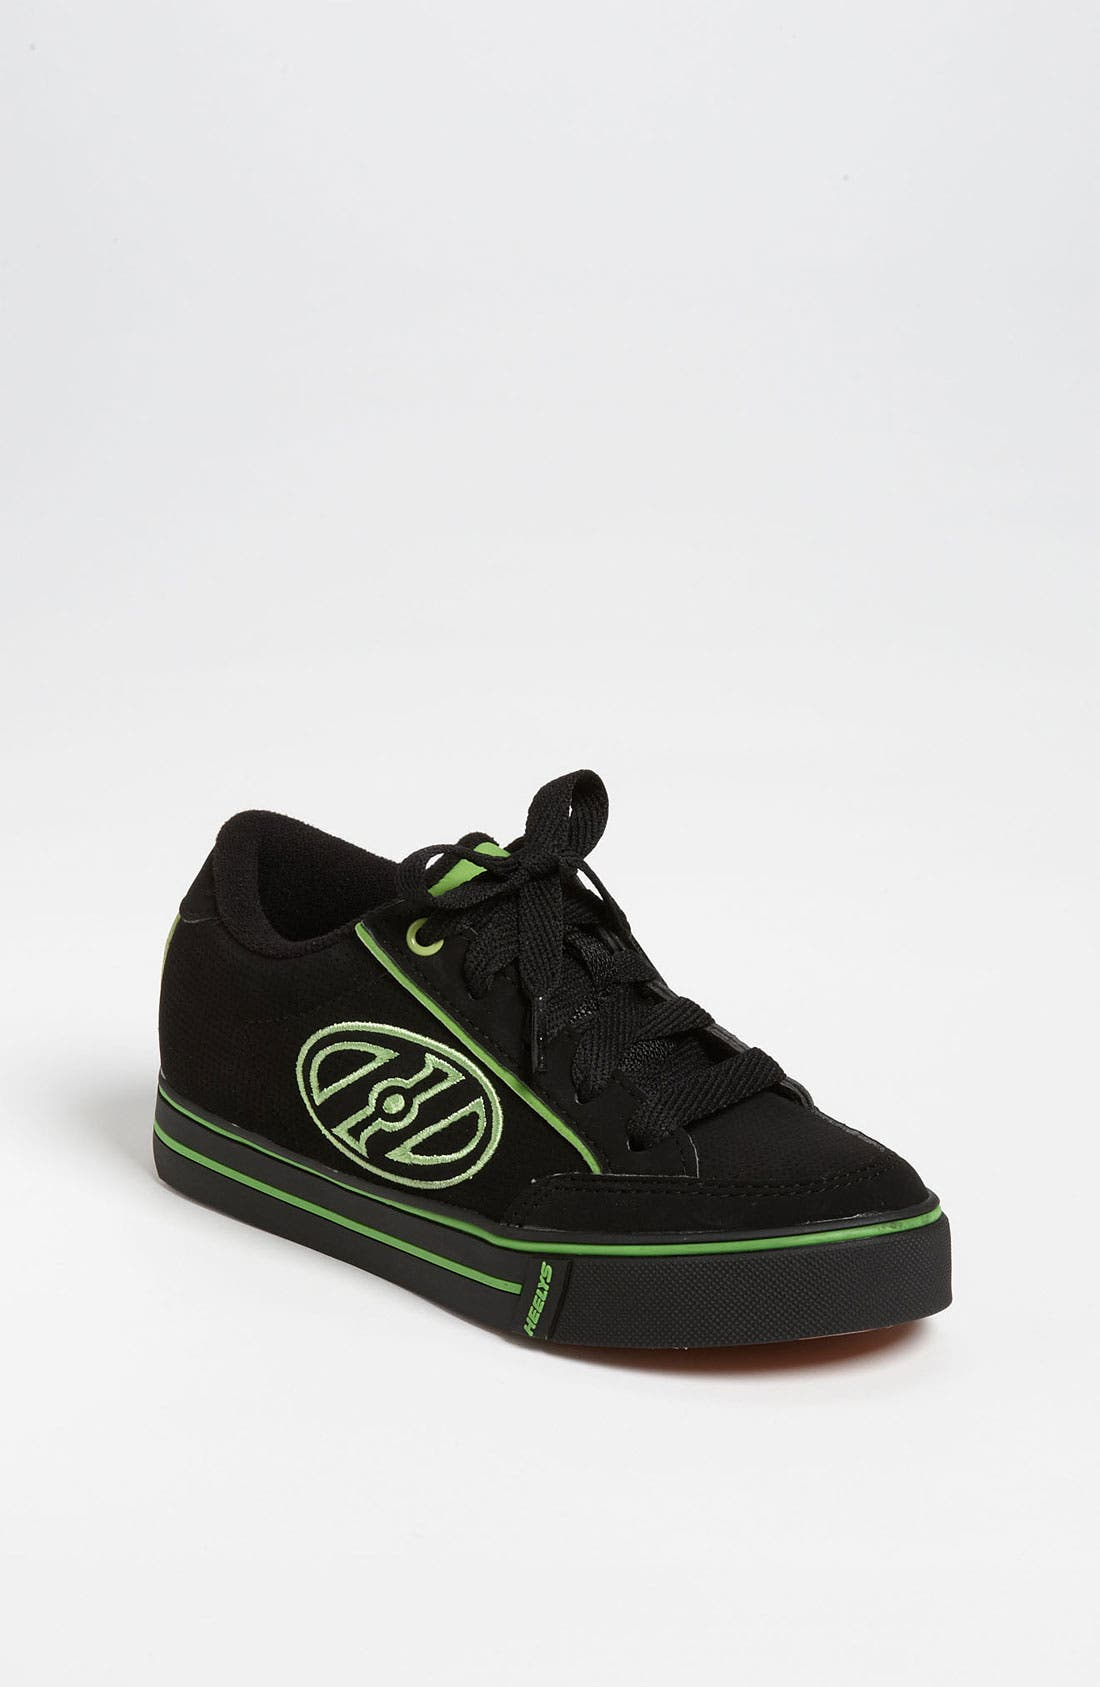 Main Image - Heelys 'Wave' Skate Shoe (Toddler, Little Kids & Big Kids)